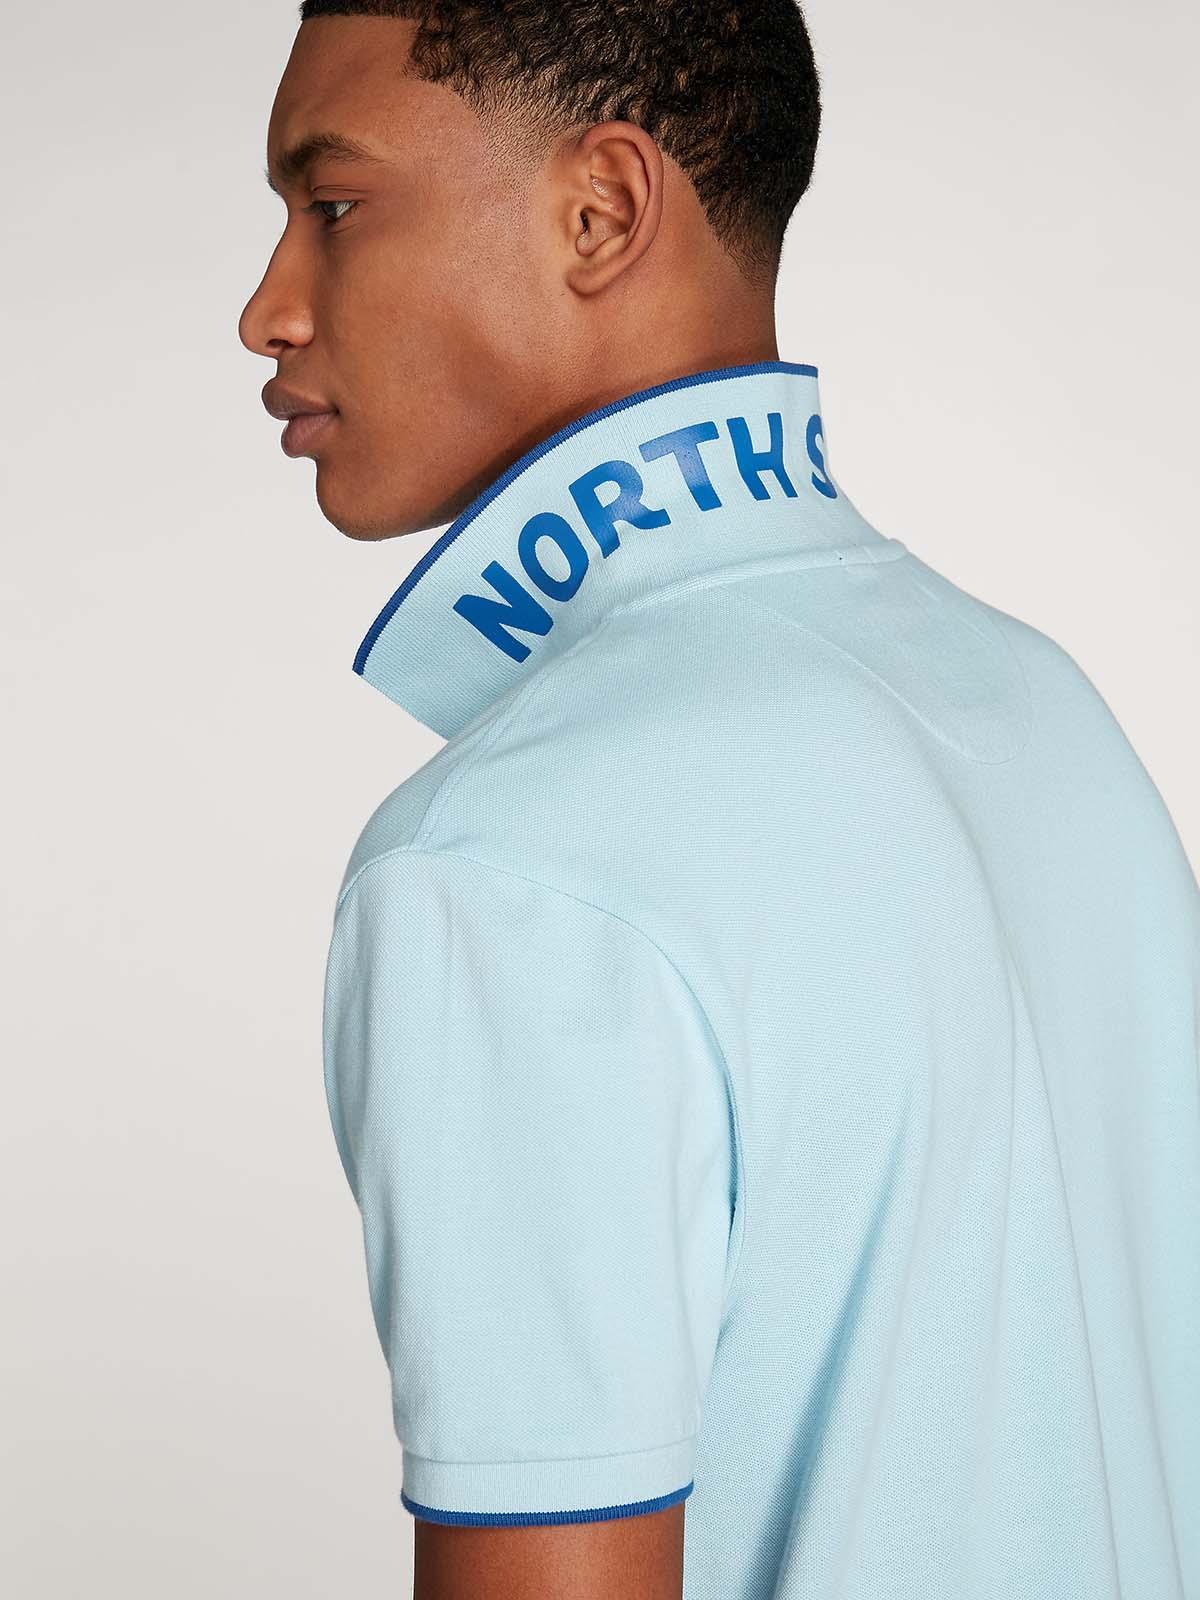 NEW-North-Sails-Legacy-Heritage-Mens-Cotton-Polo-Shirt-Top-Size-S-M-L-XL-XXL-3XL thumbnail 41